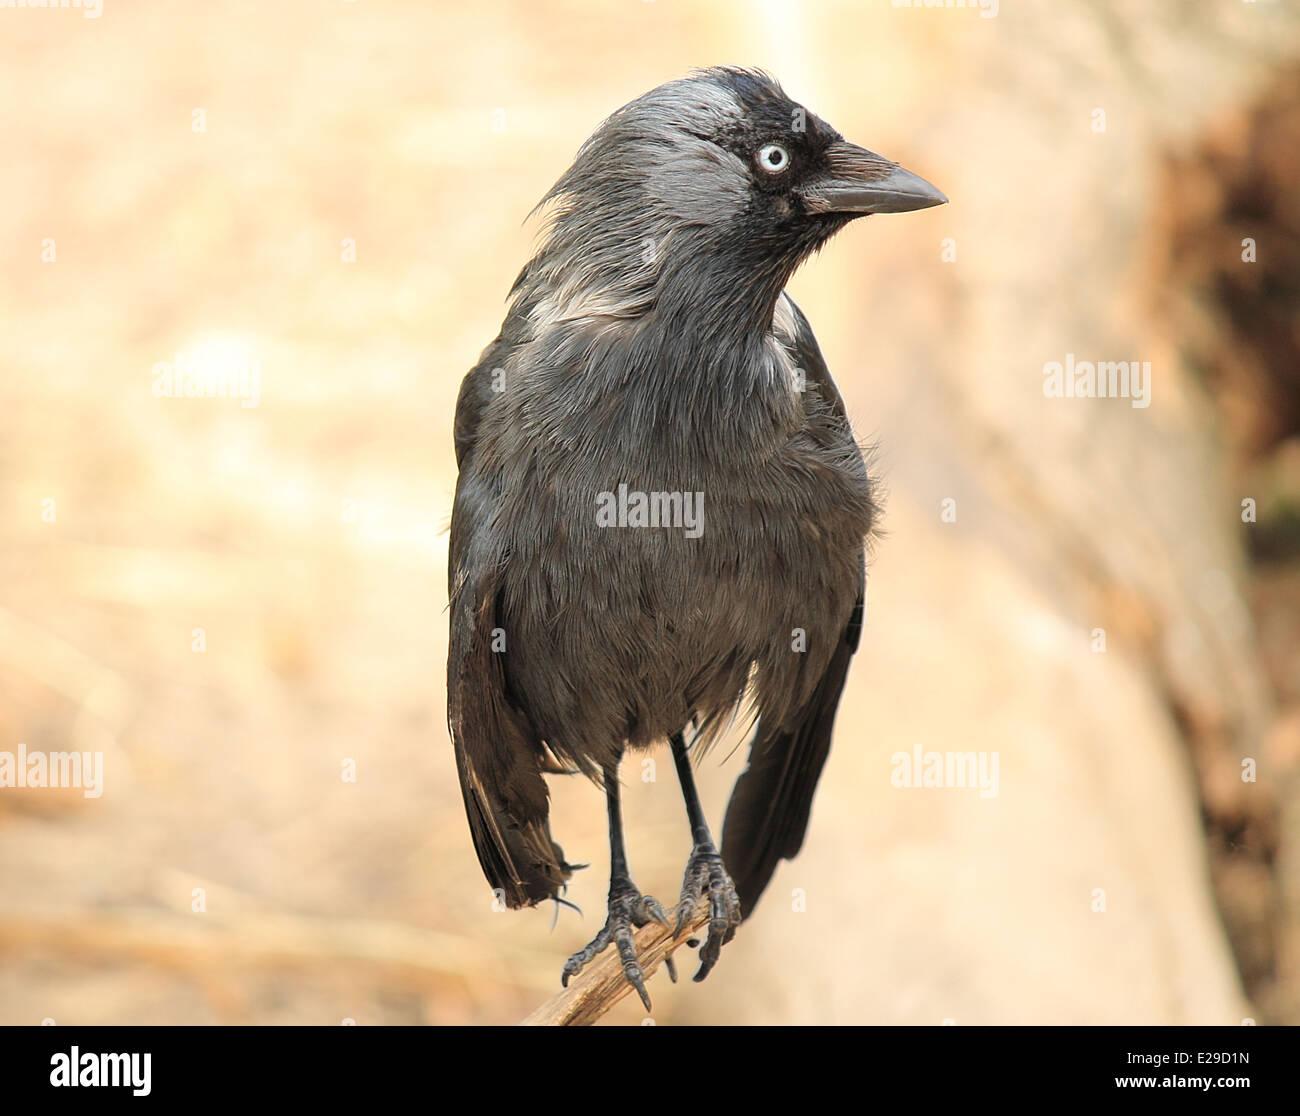 Black raven close-up - Stock Image